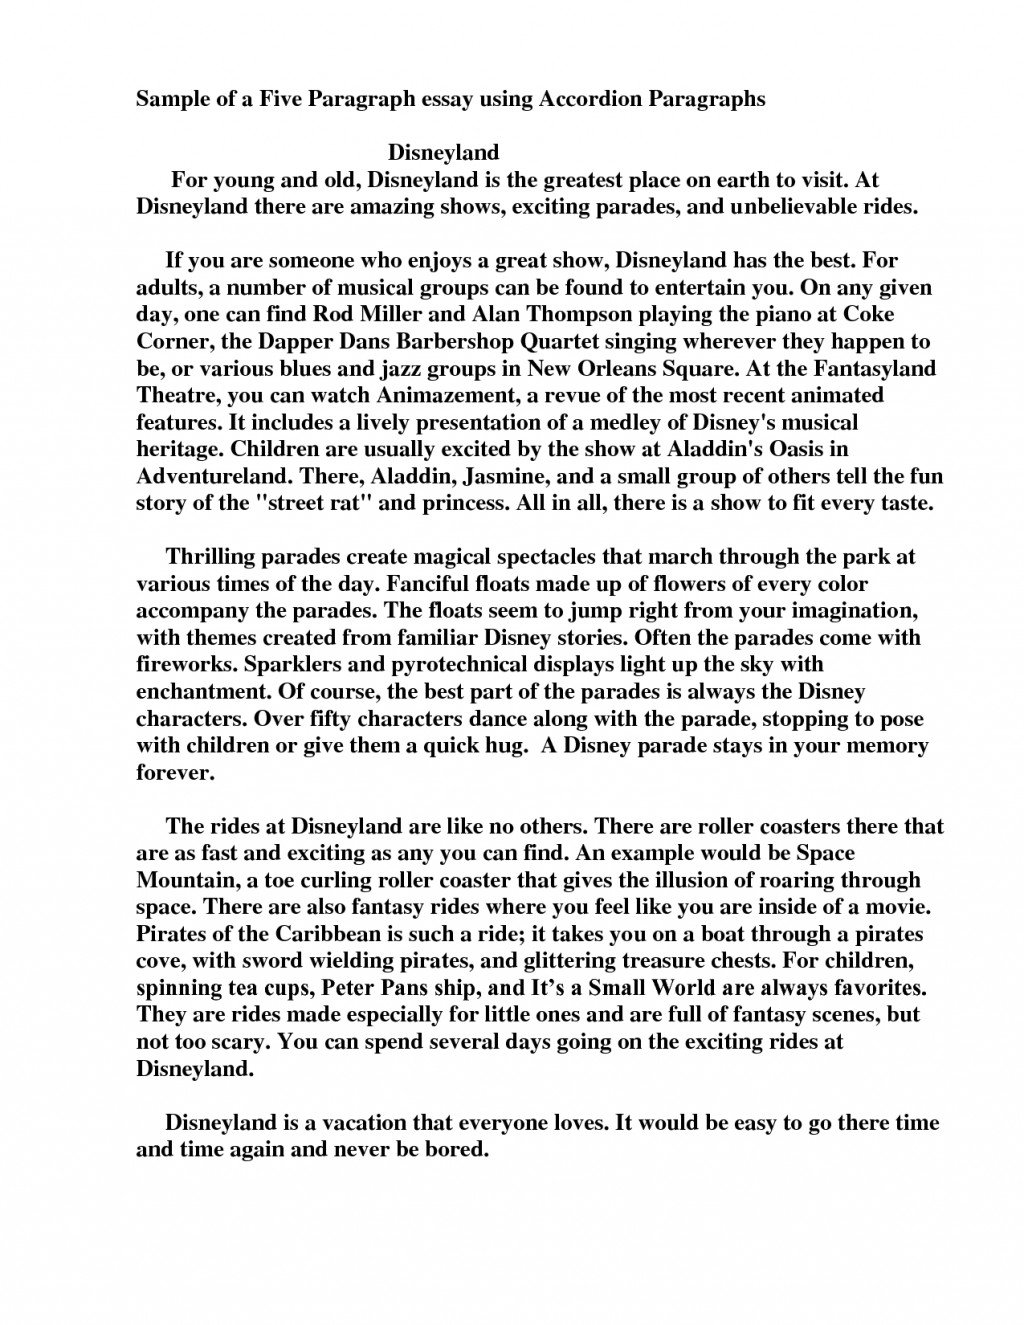 004 Format Of Paragraph Essay Inspirational Sample Five Stirring 5 Example High School Pdf Argumentative Outline Template Large